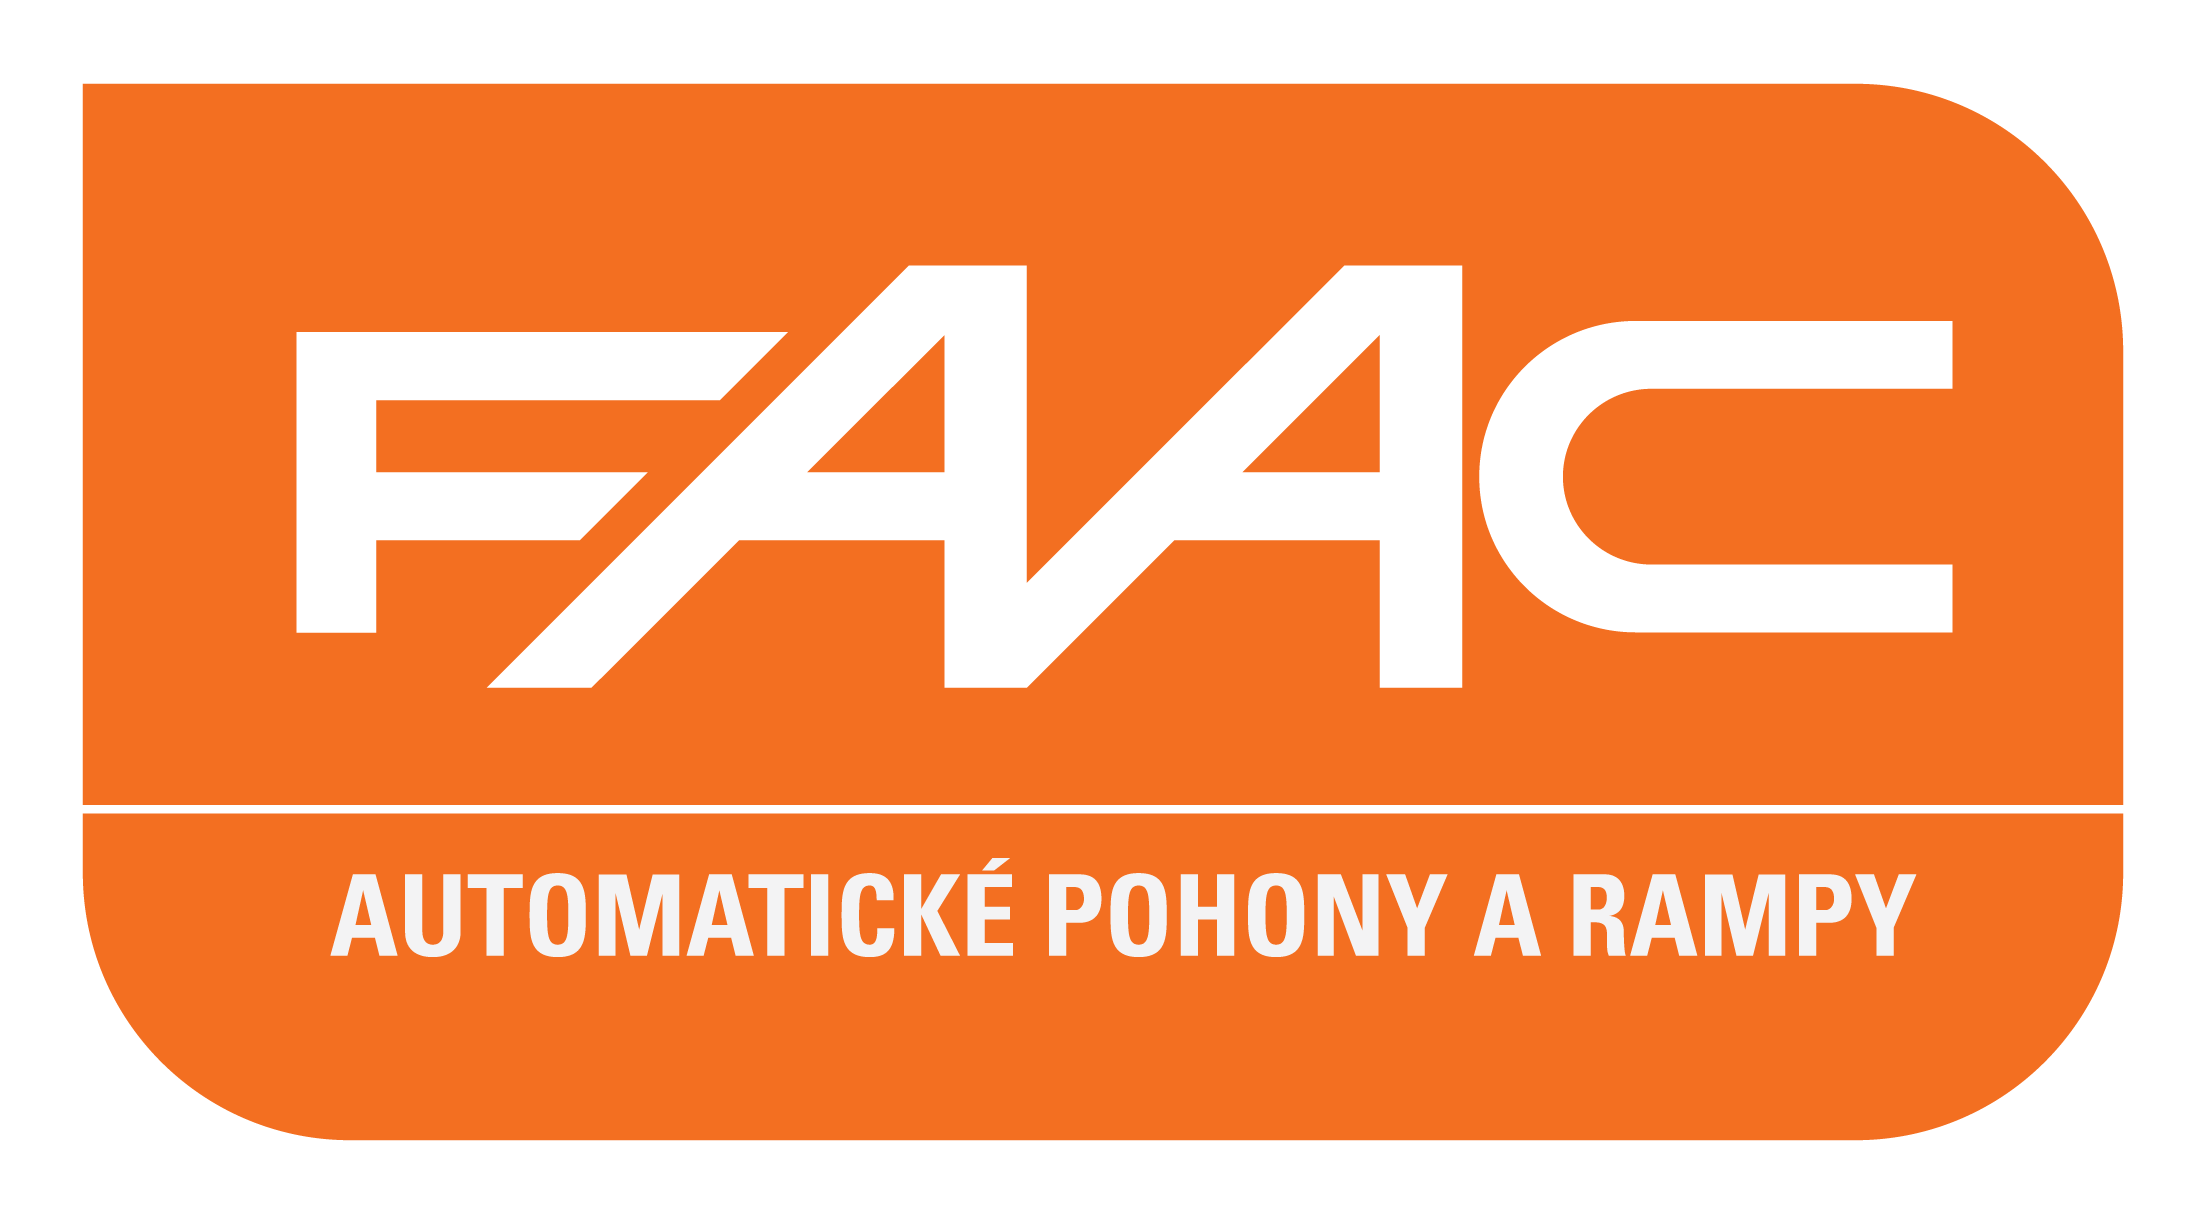 Automatické pohony a rampy FAAC